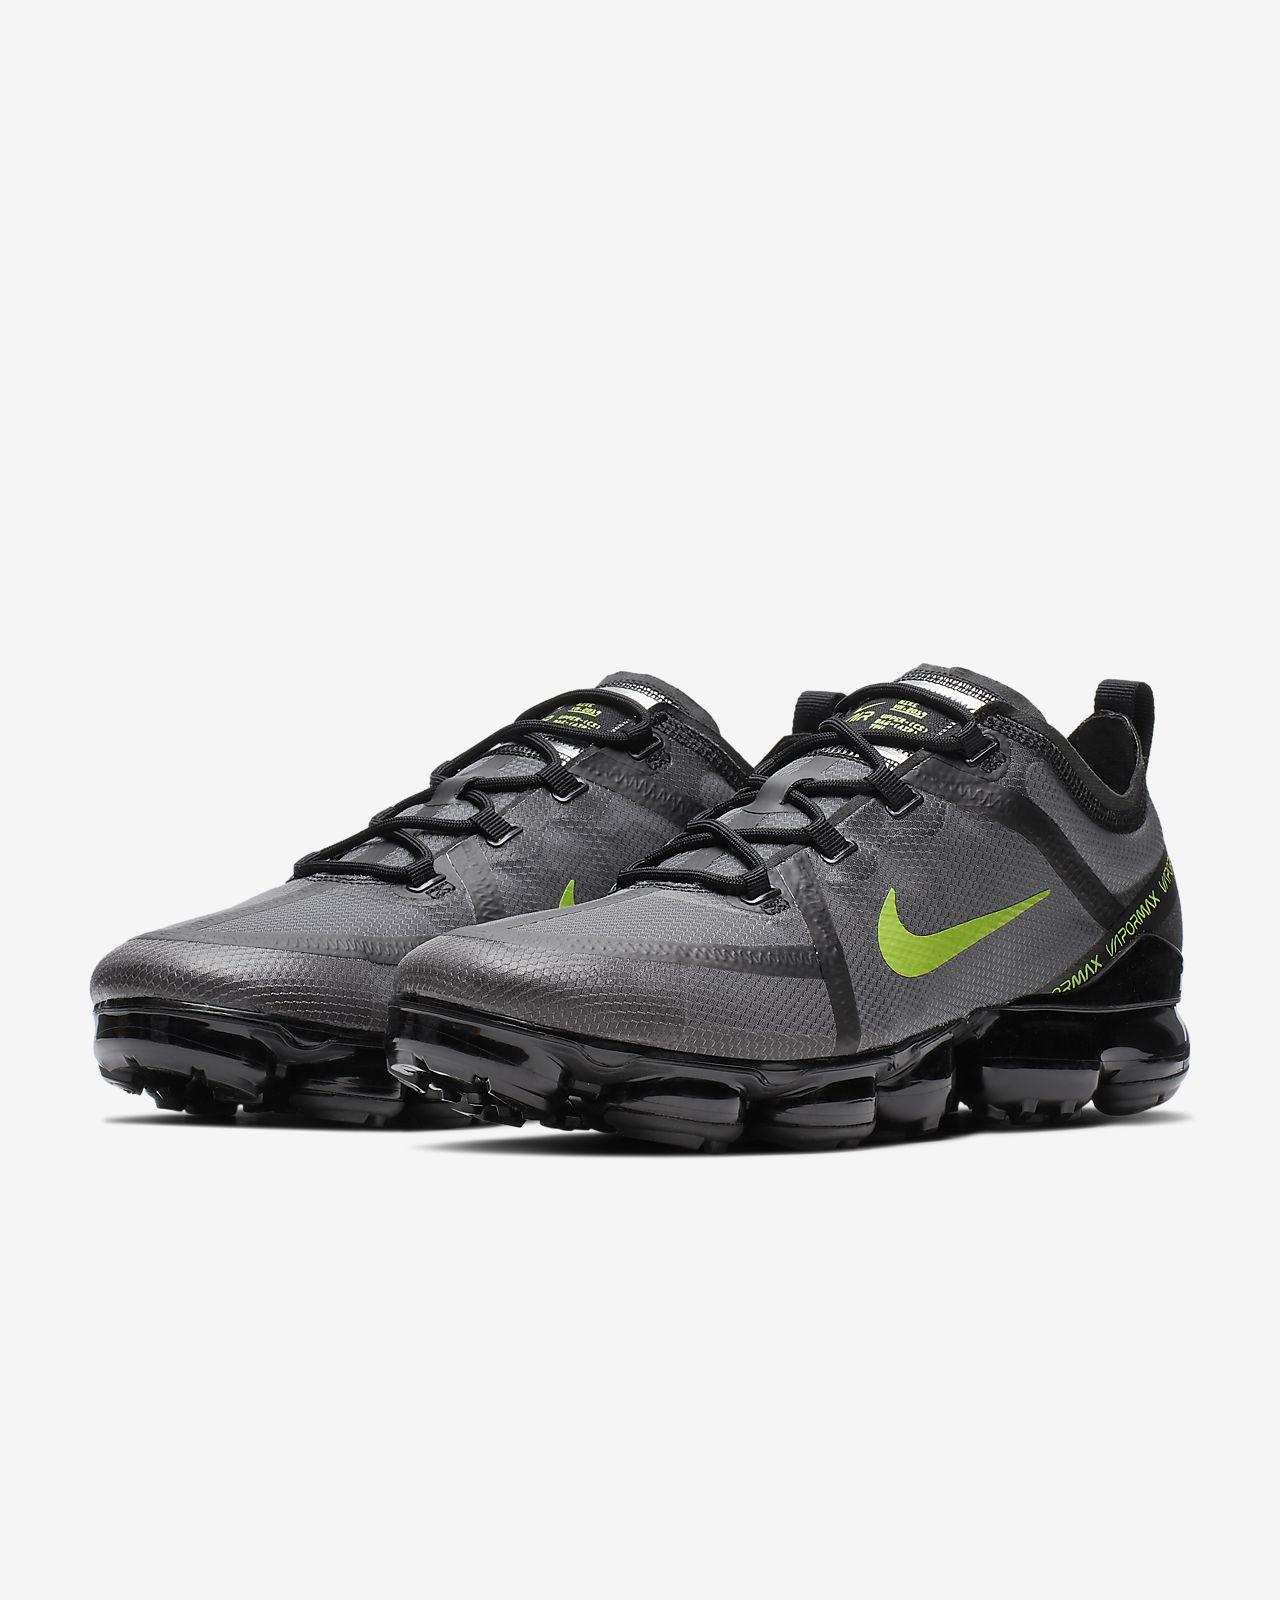 05455037 Мужские кроссовки Nike Air VaporMax 2019. Nike.com RU